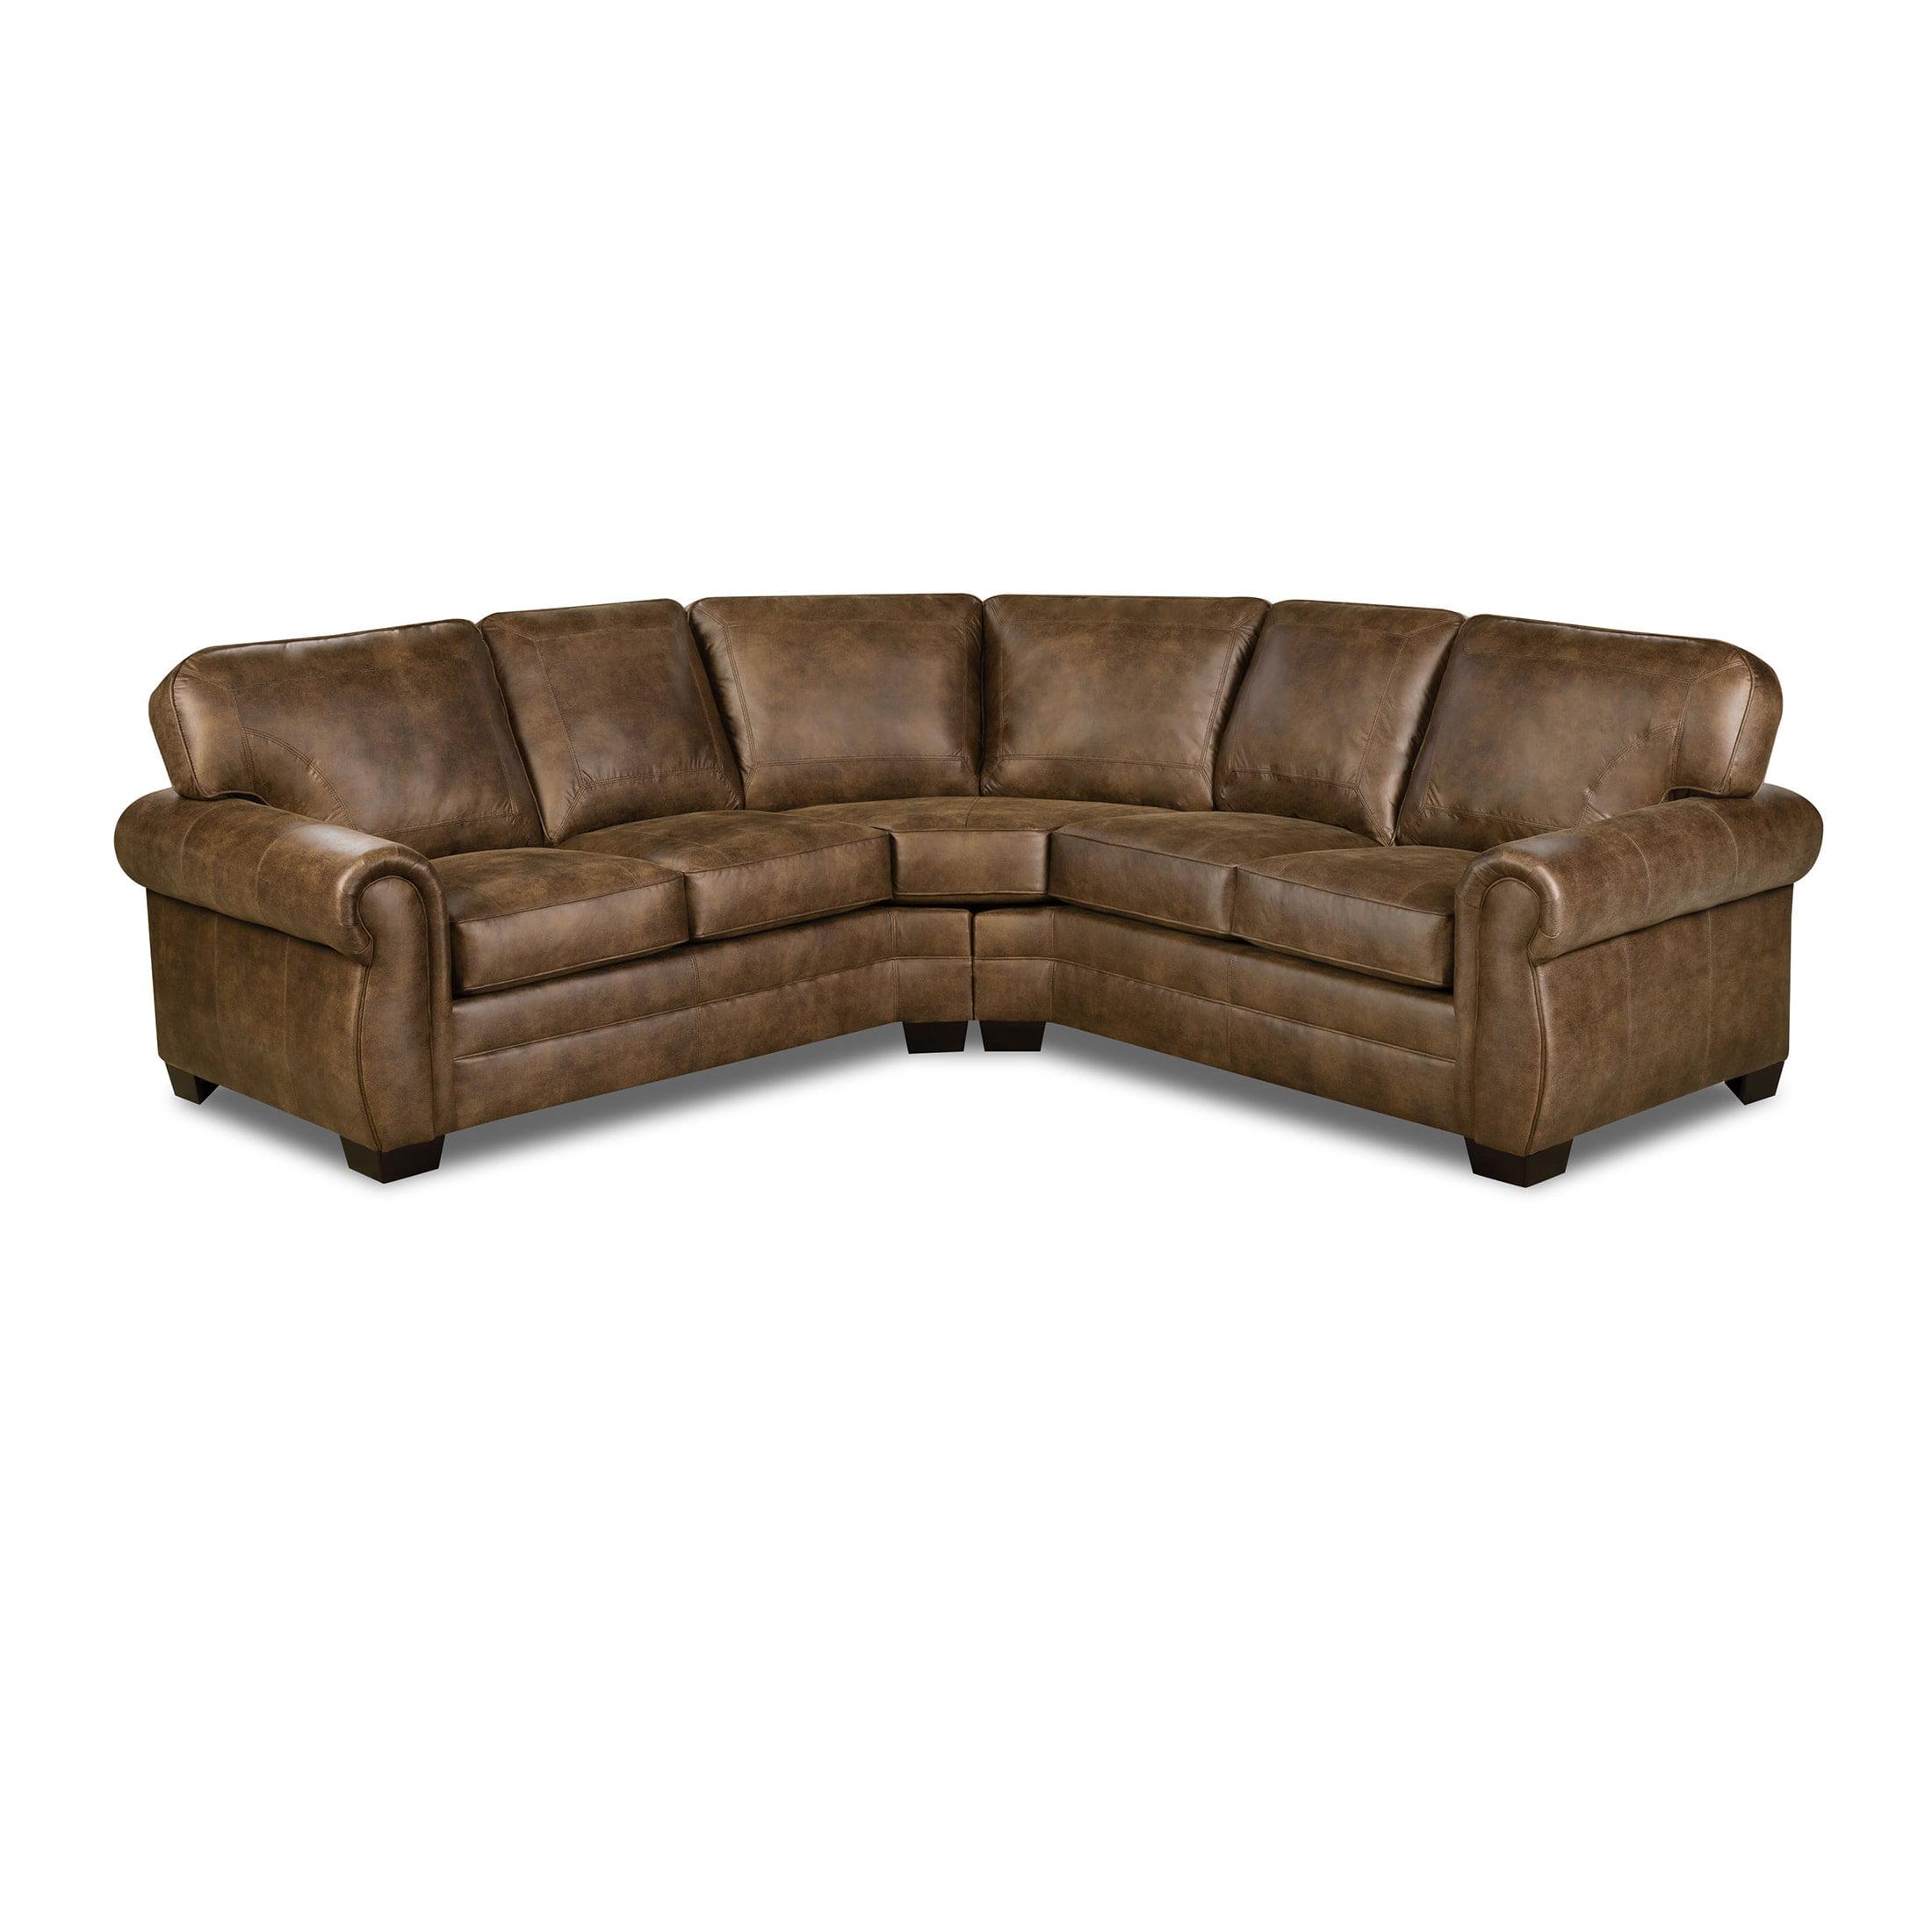 Merveilleux Simmons Upholstery Shiloh Sectional   Walmart.com